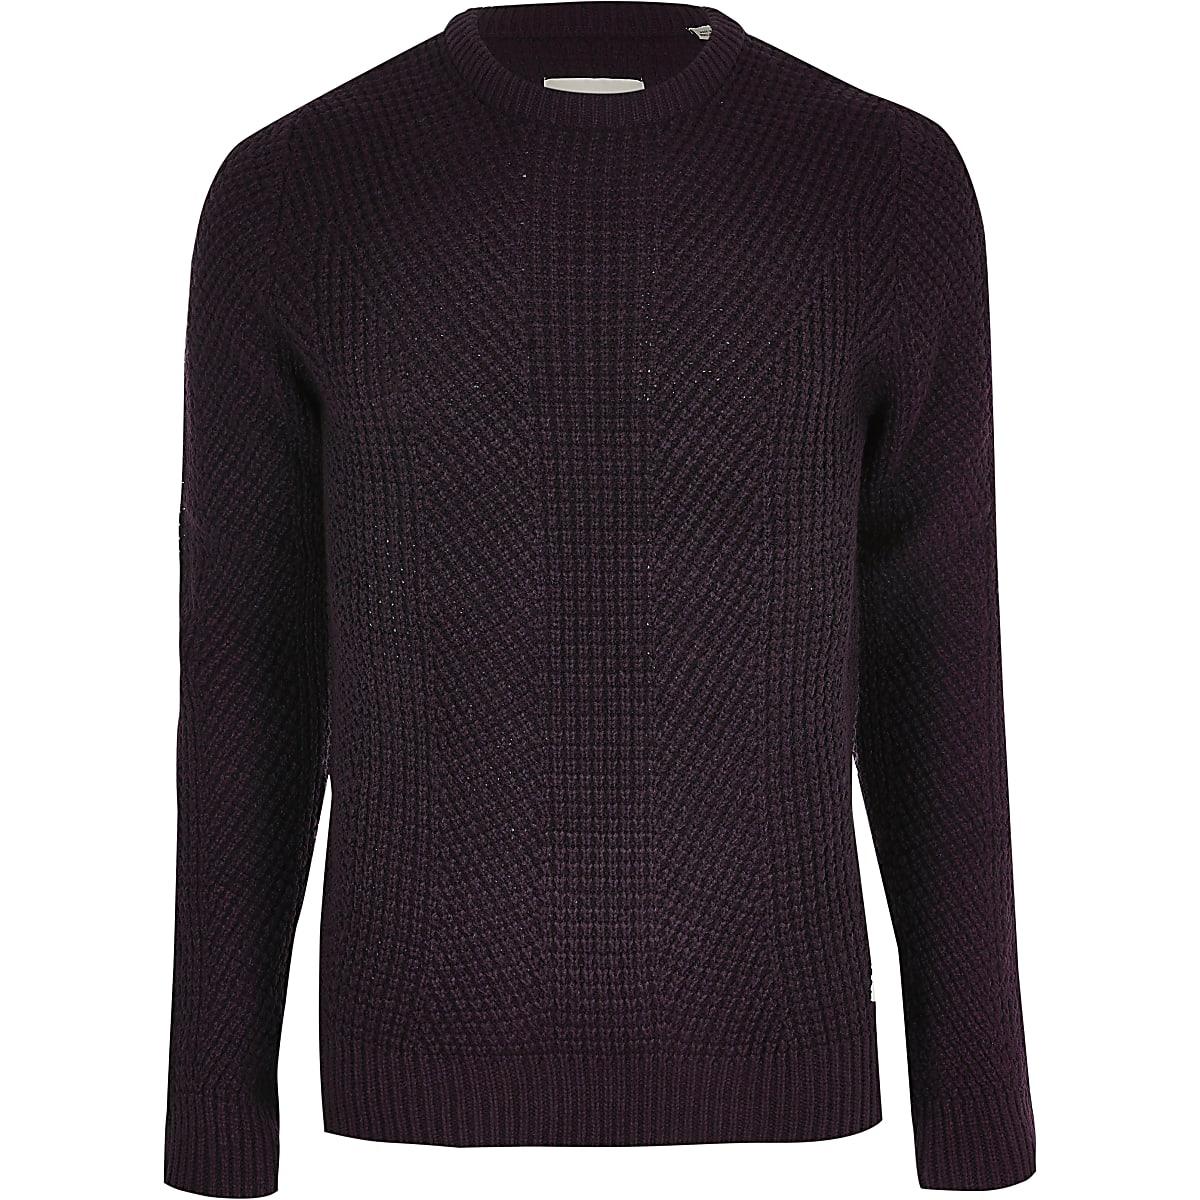 Jack and Jones dark red knit jumper